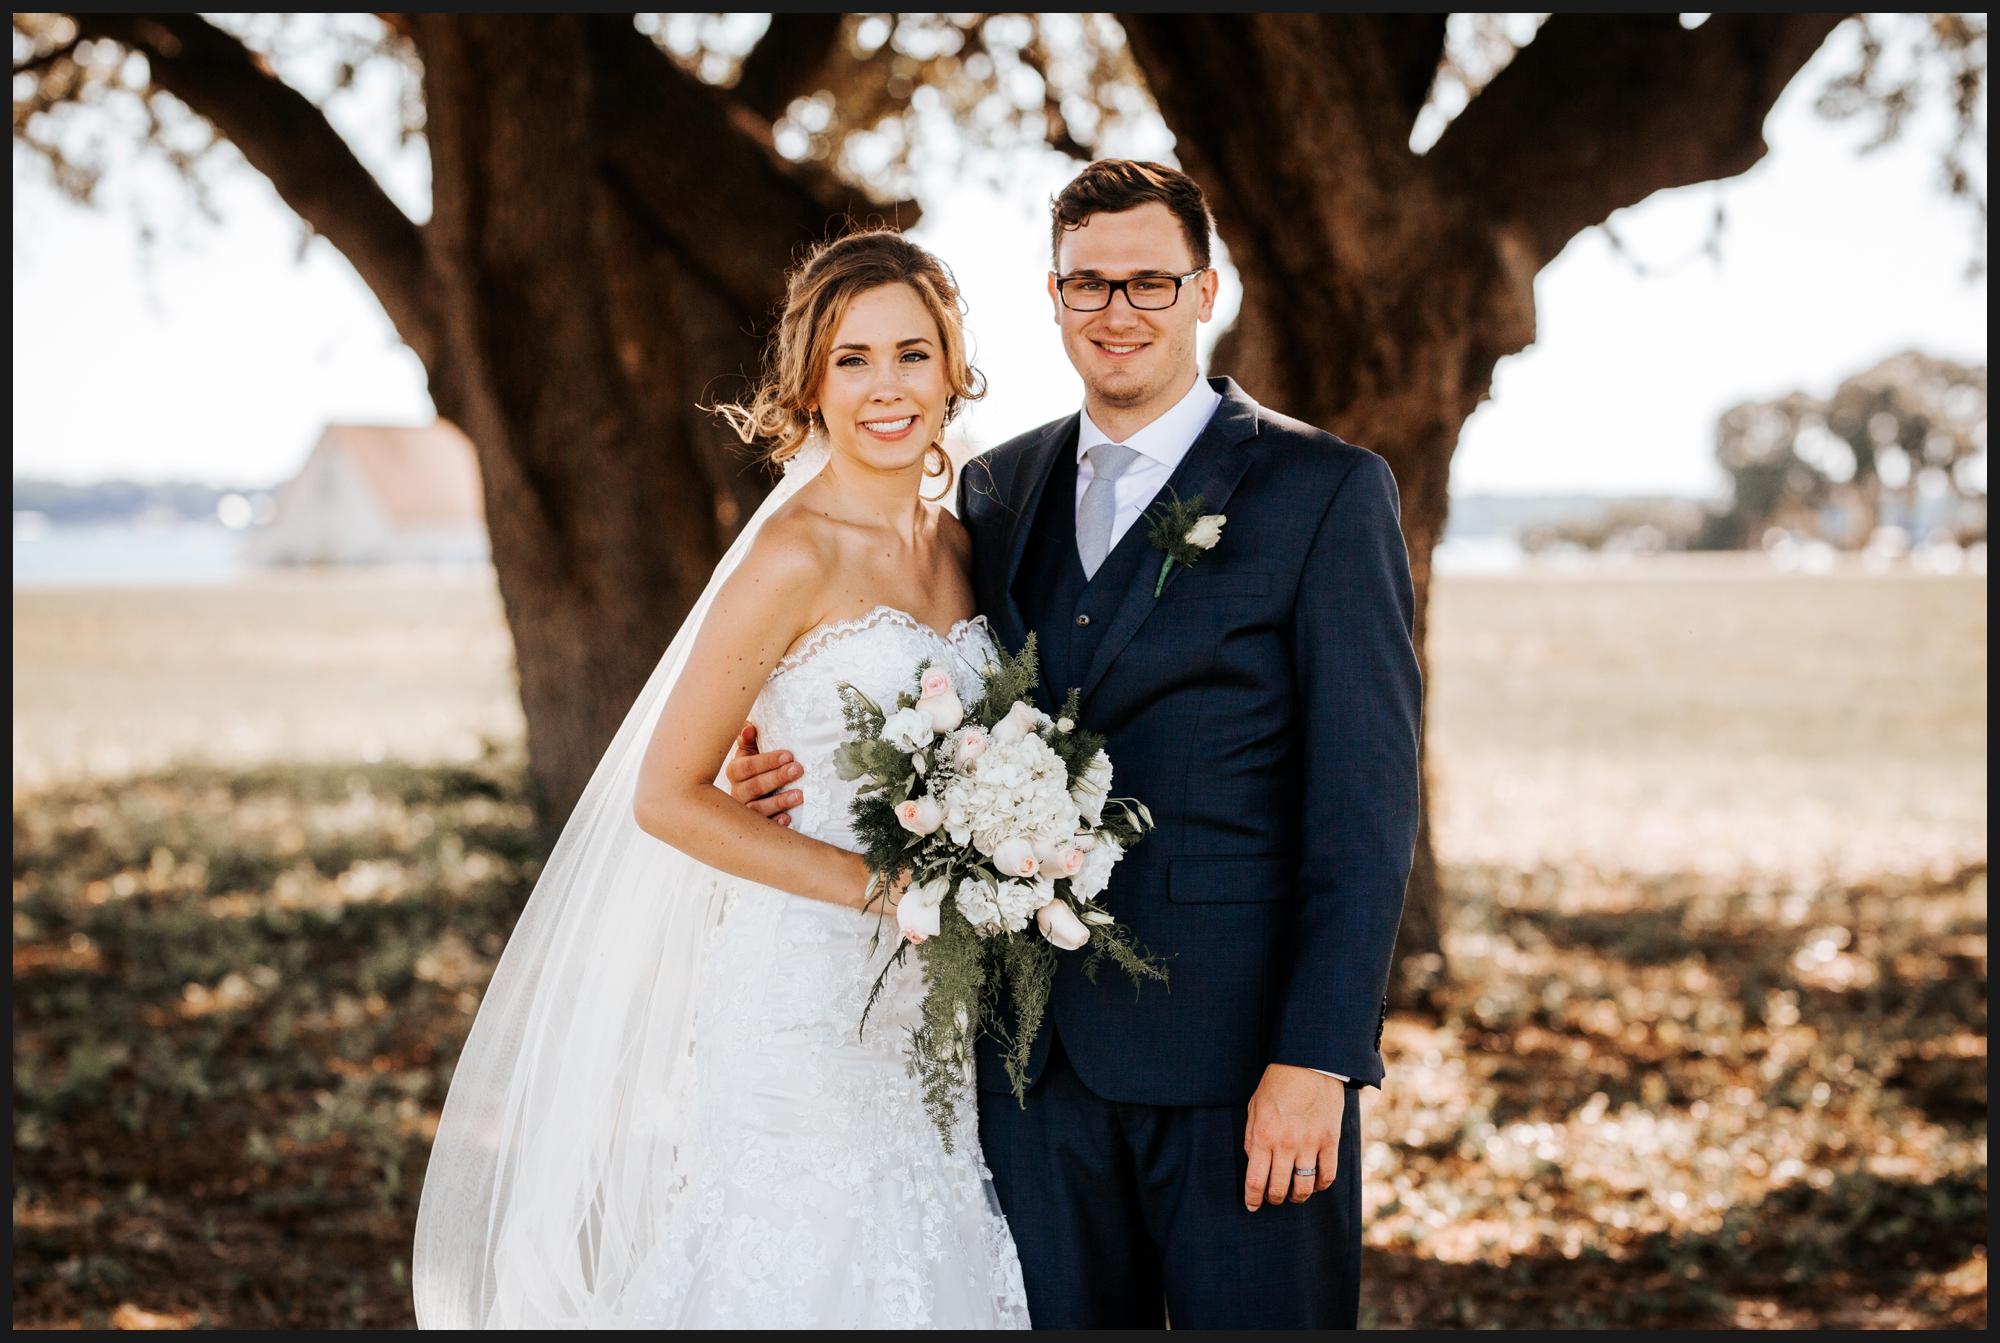 Orlando-Wedding-Photographer-destination-wedding-photographer-florida-wedding-photographer-bohemian-wedding-photographer_0087.jpg